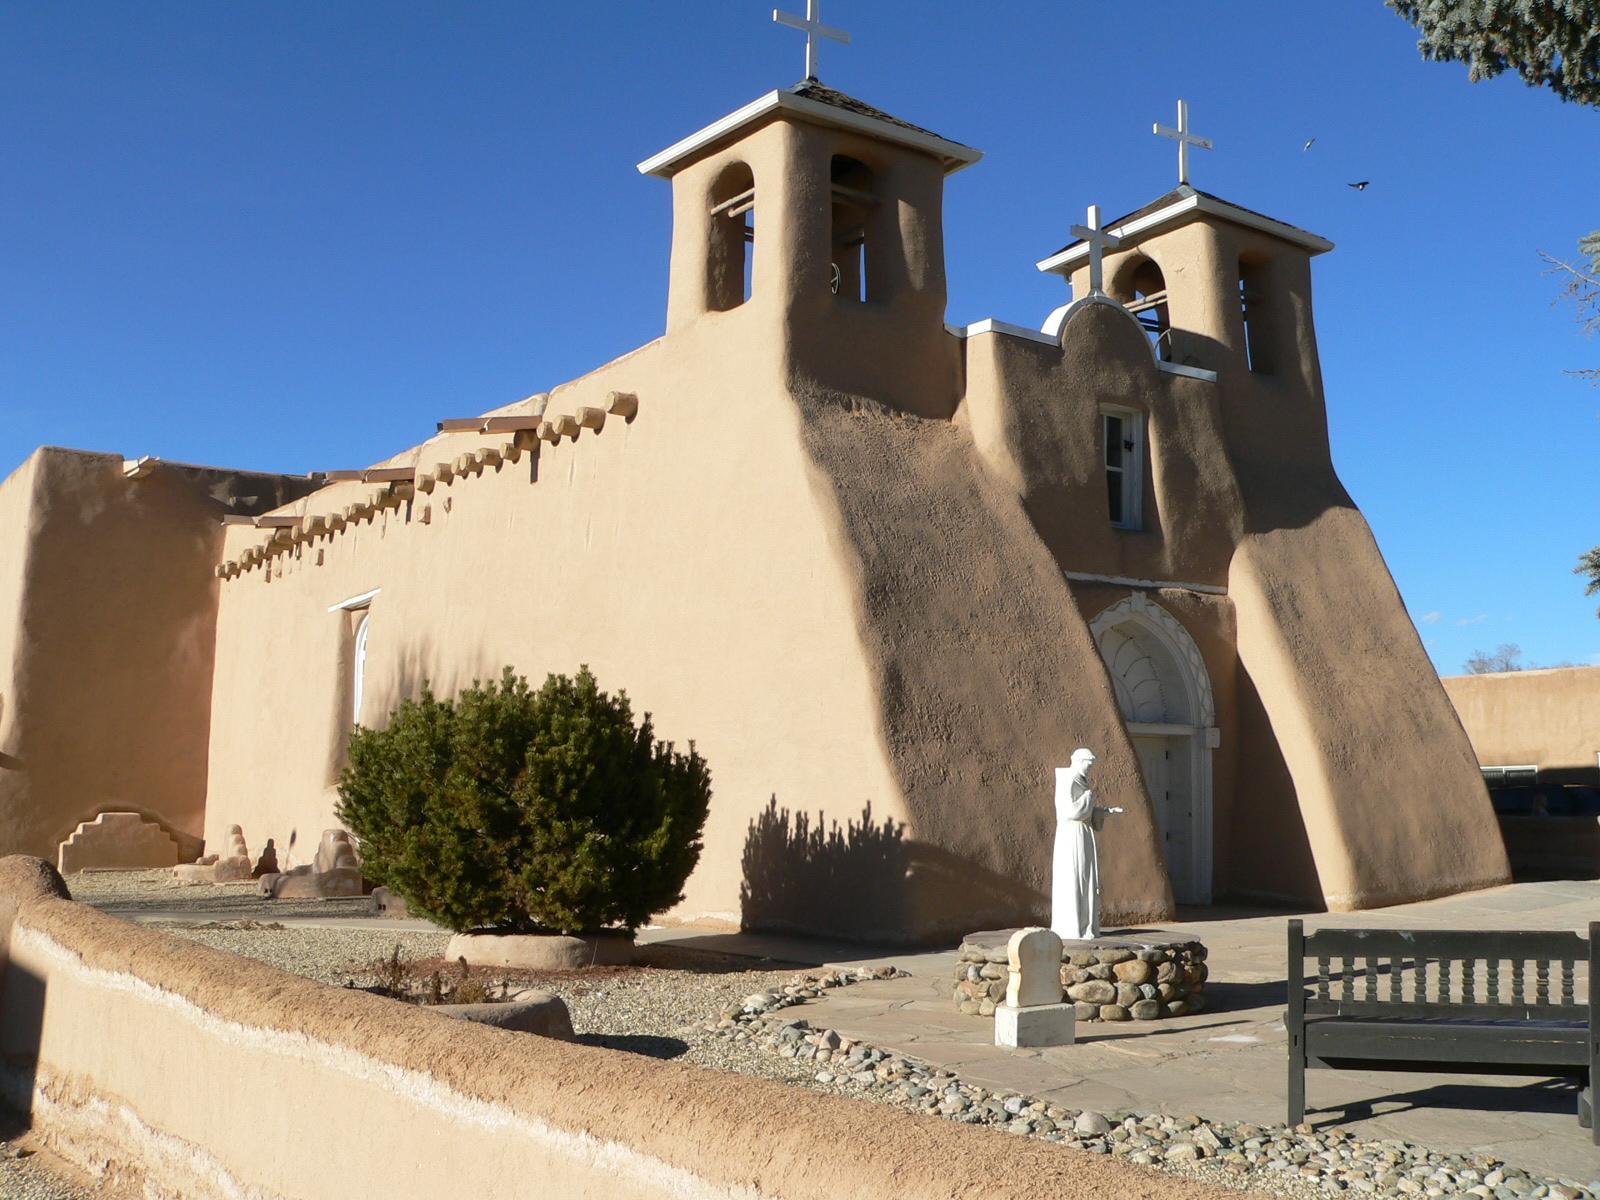 Rancho del Taos, New Mexico